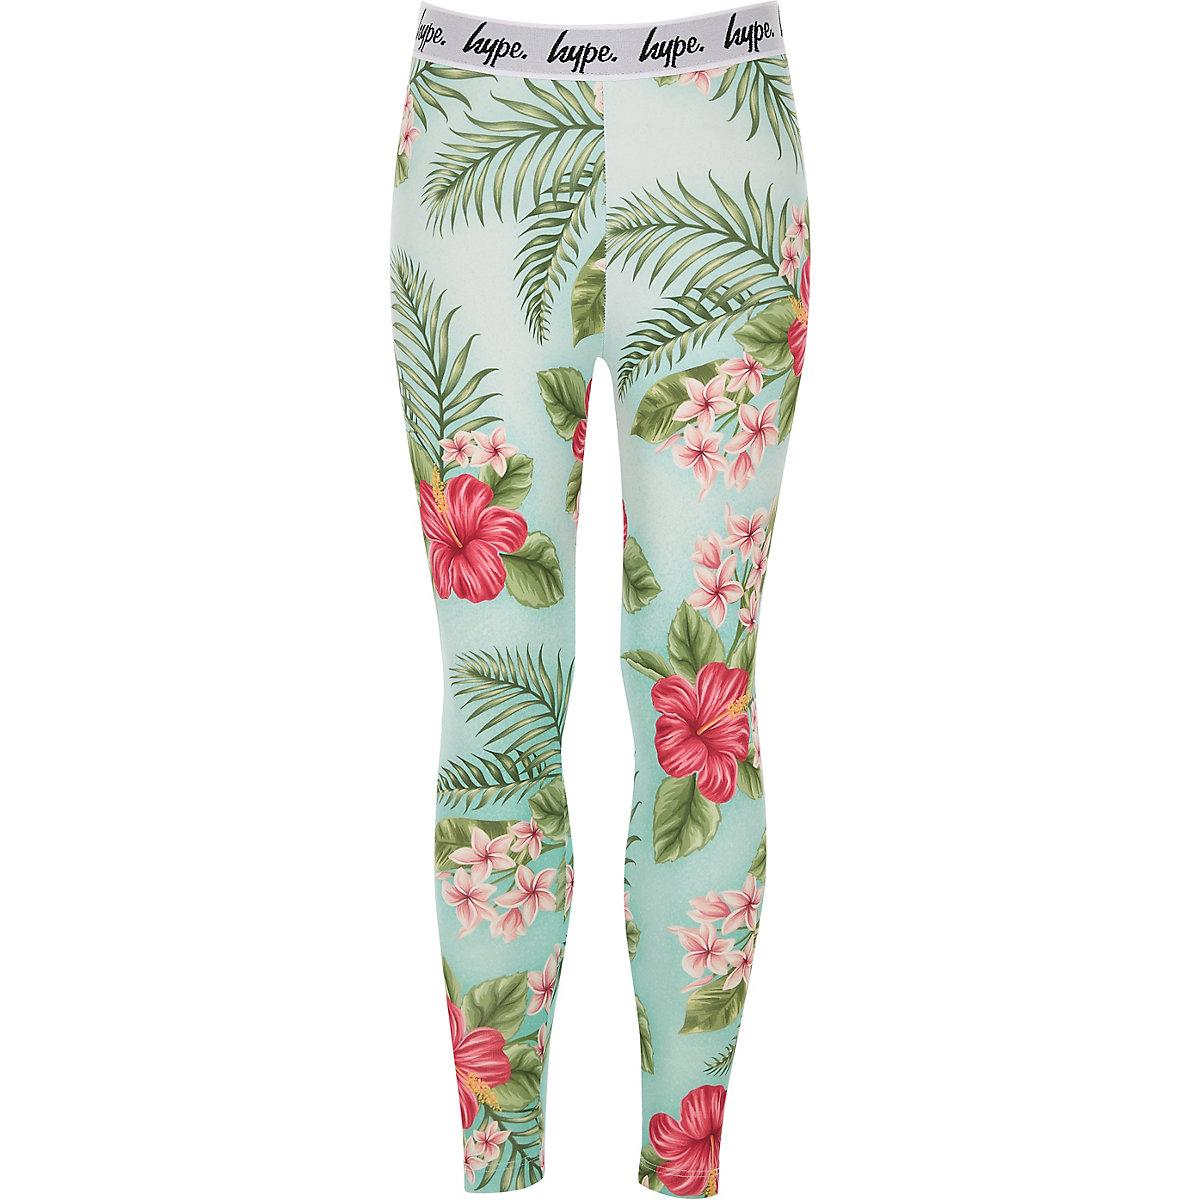 Girls Hype green tropical print leggings